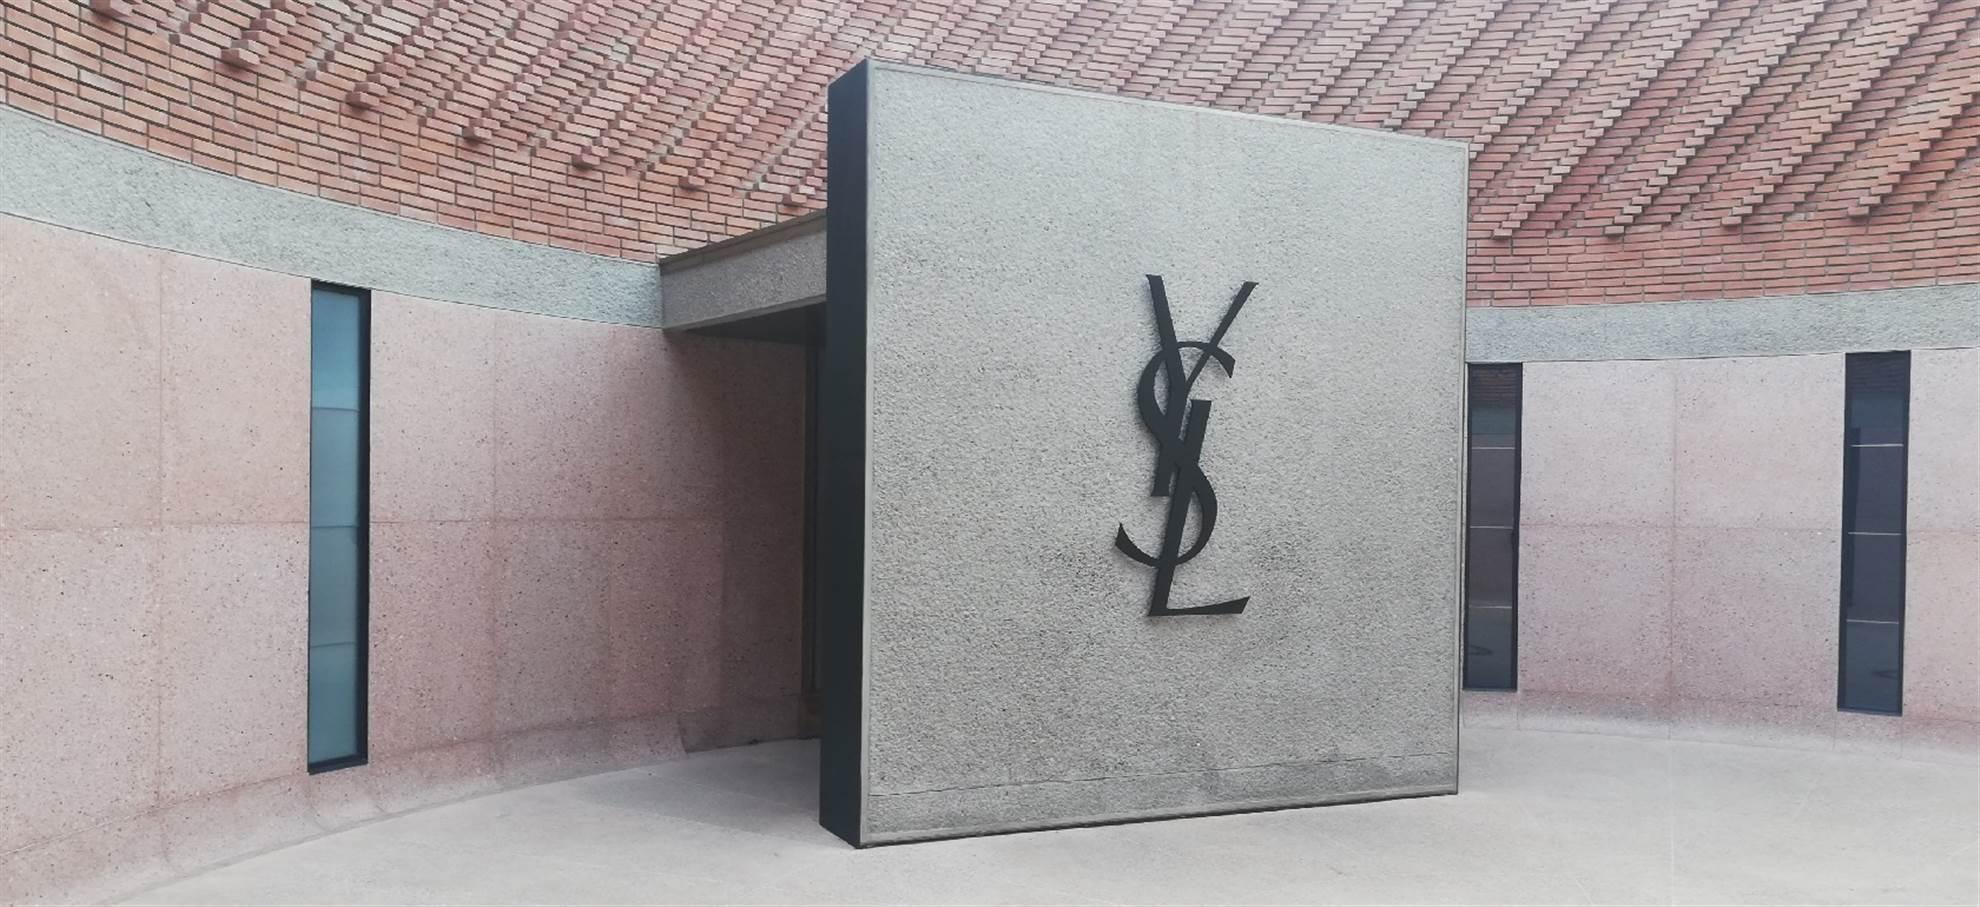 Yves Saint-Laurent Museum - Skip-the-line ticket!